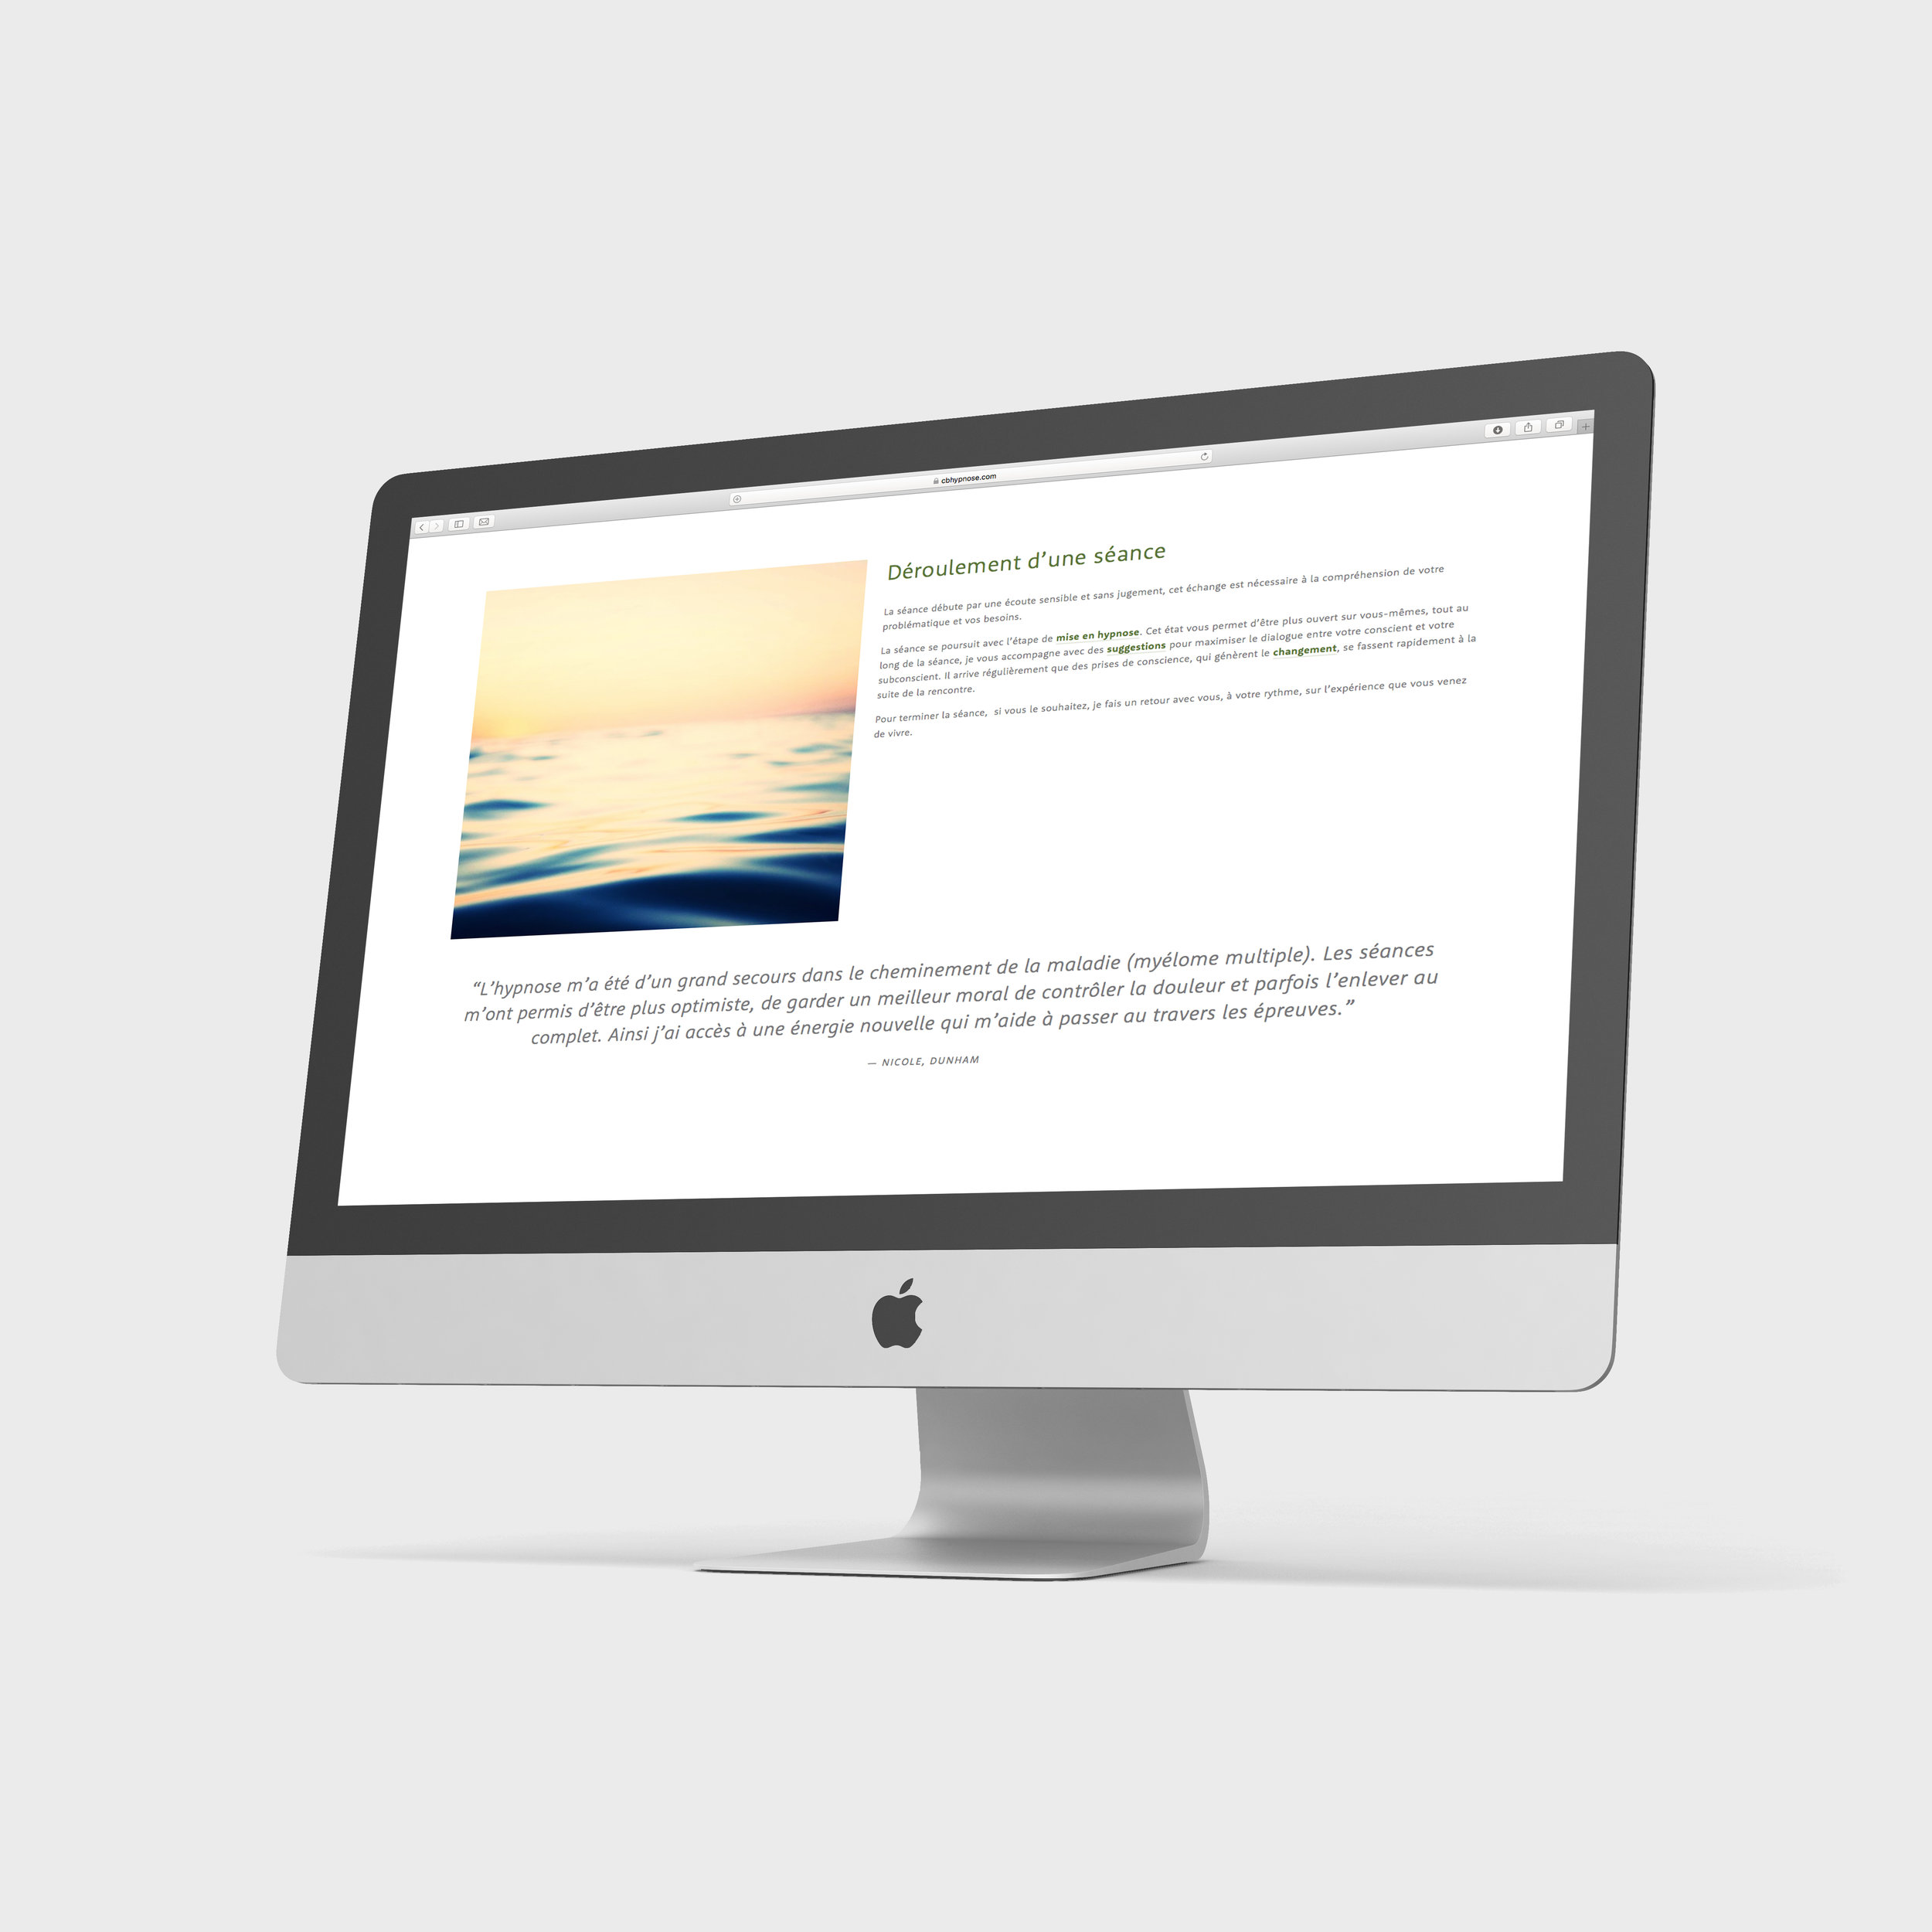 iMac-CBHyp-3.jpg